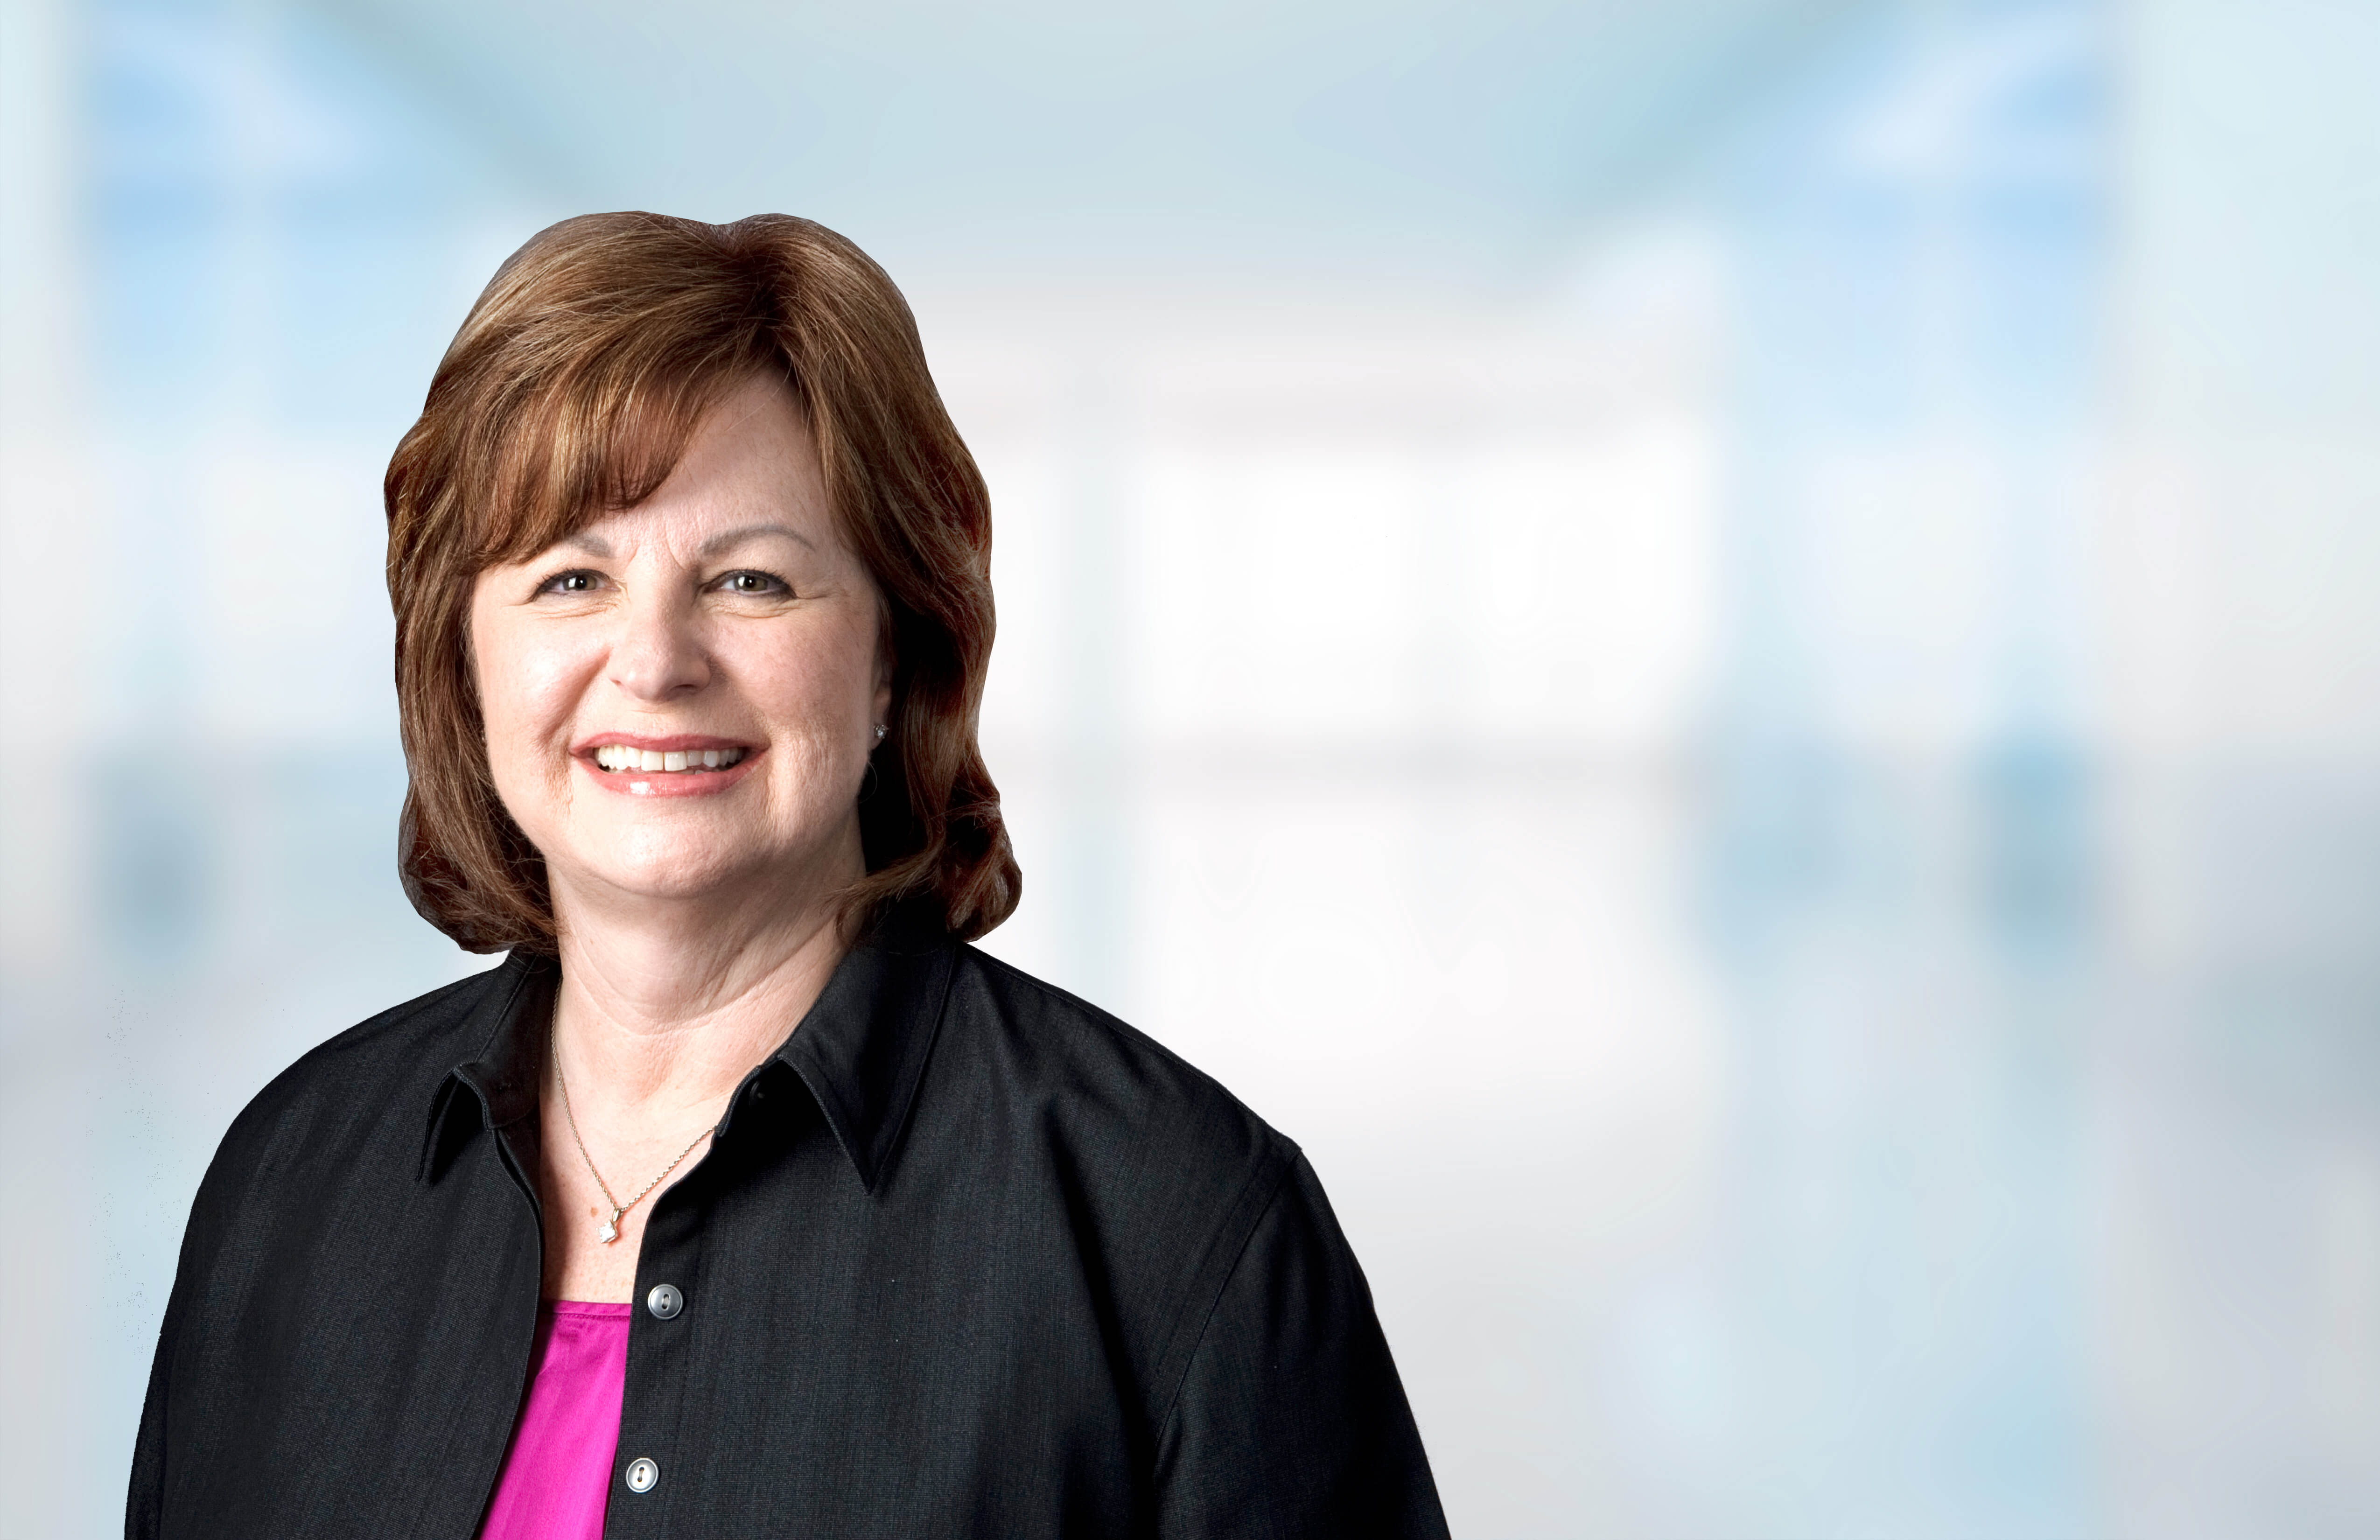 Linda M. Dillman